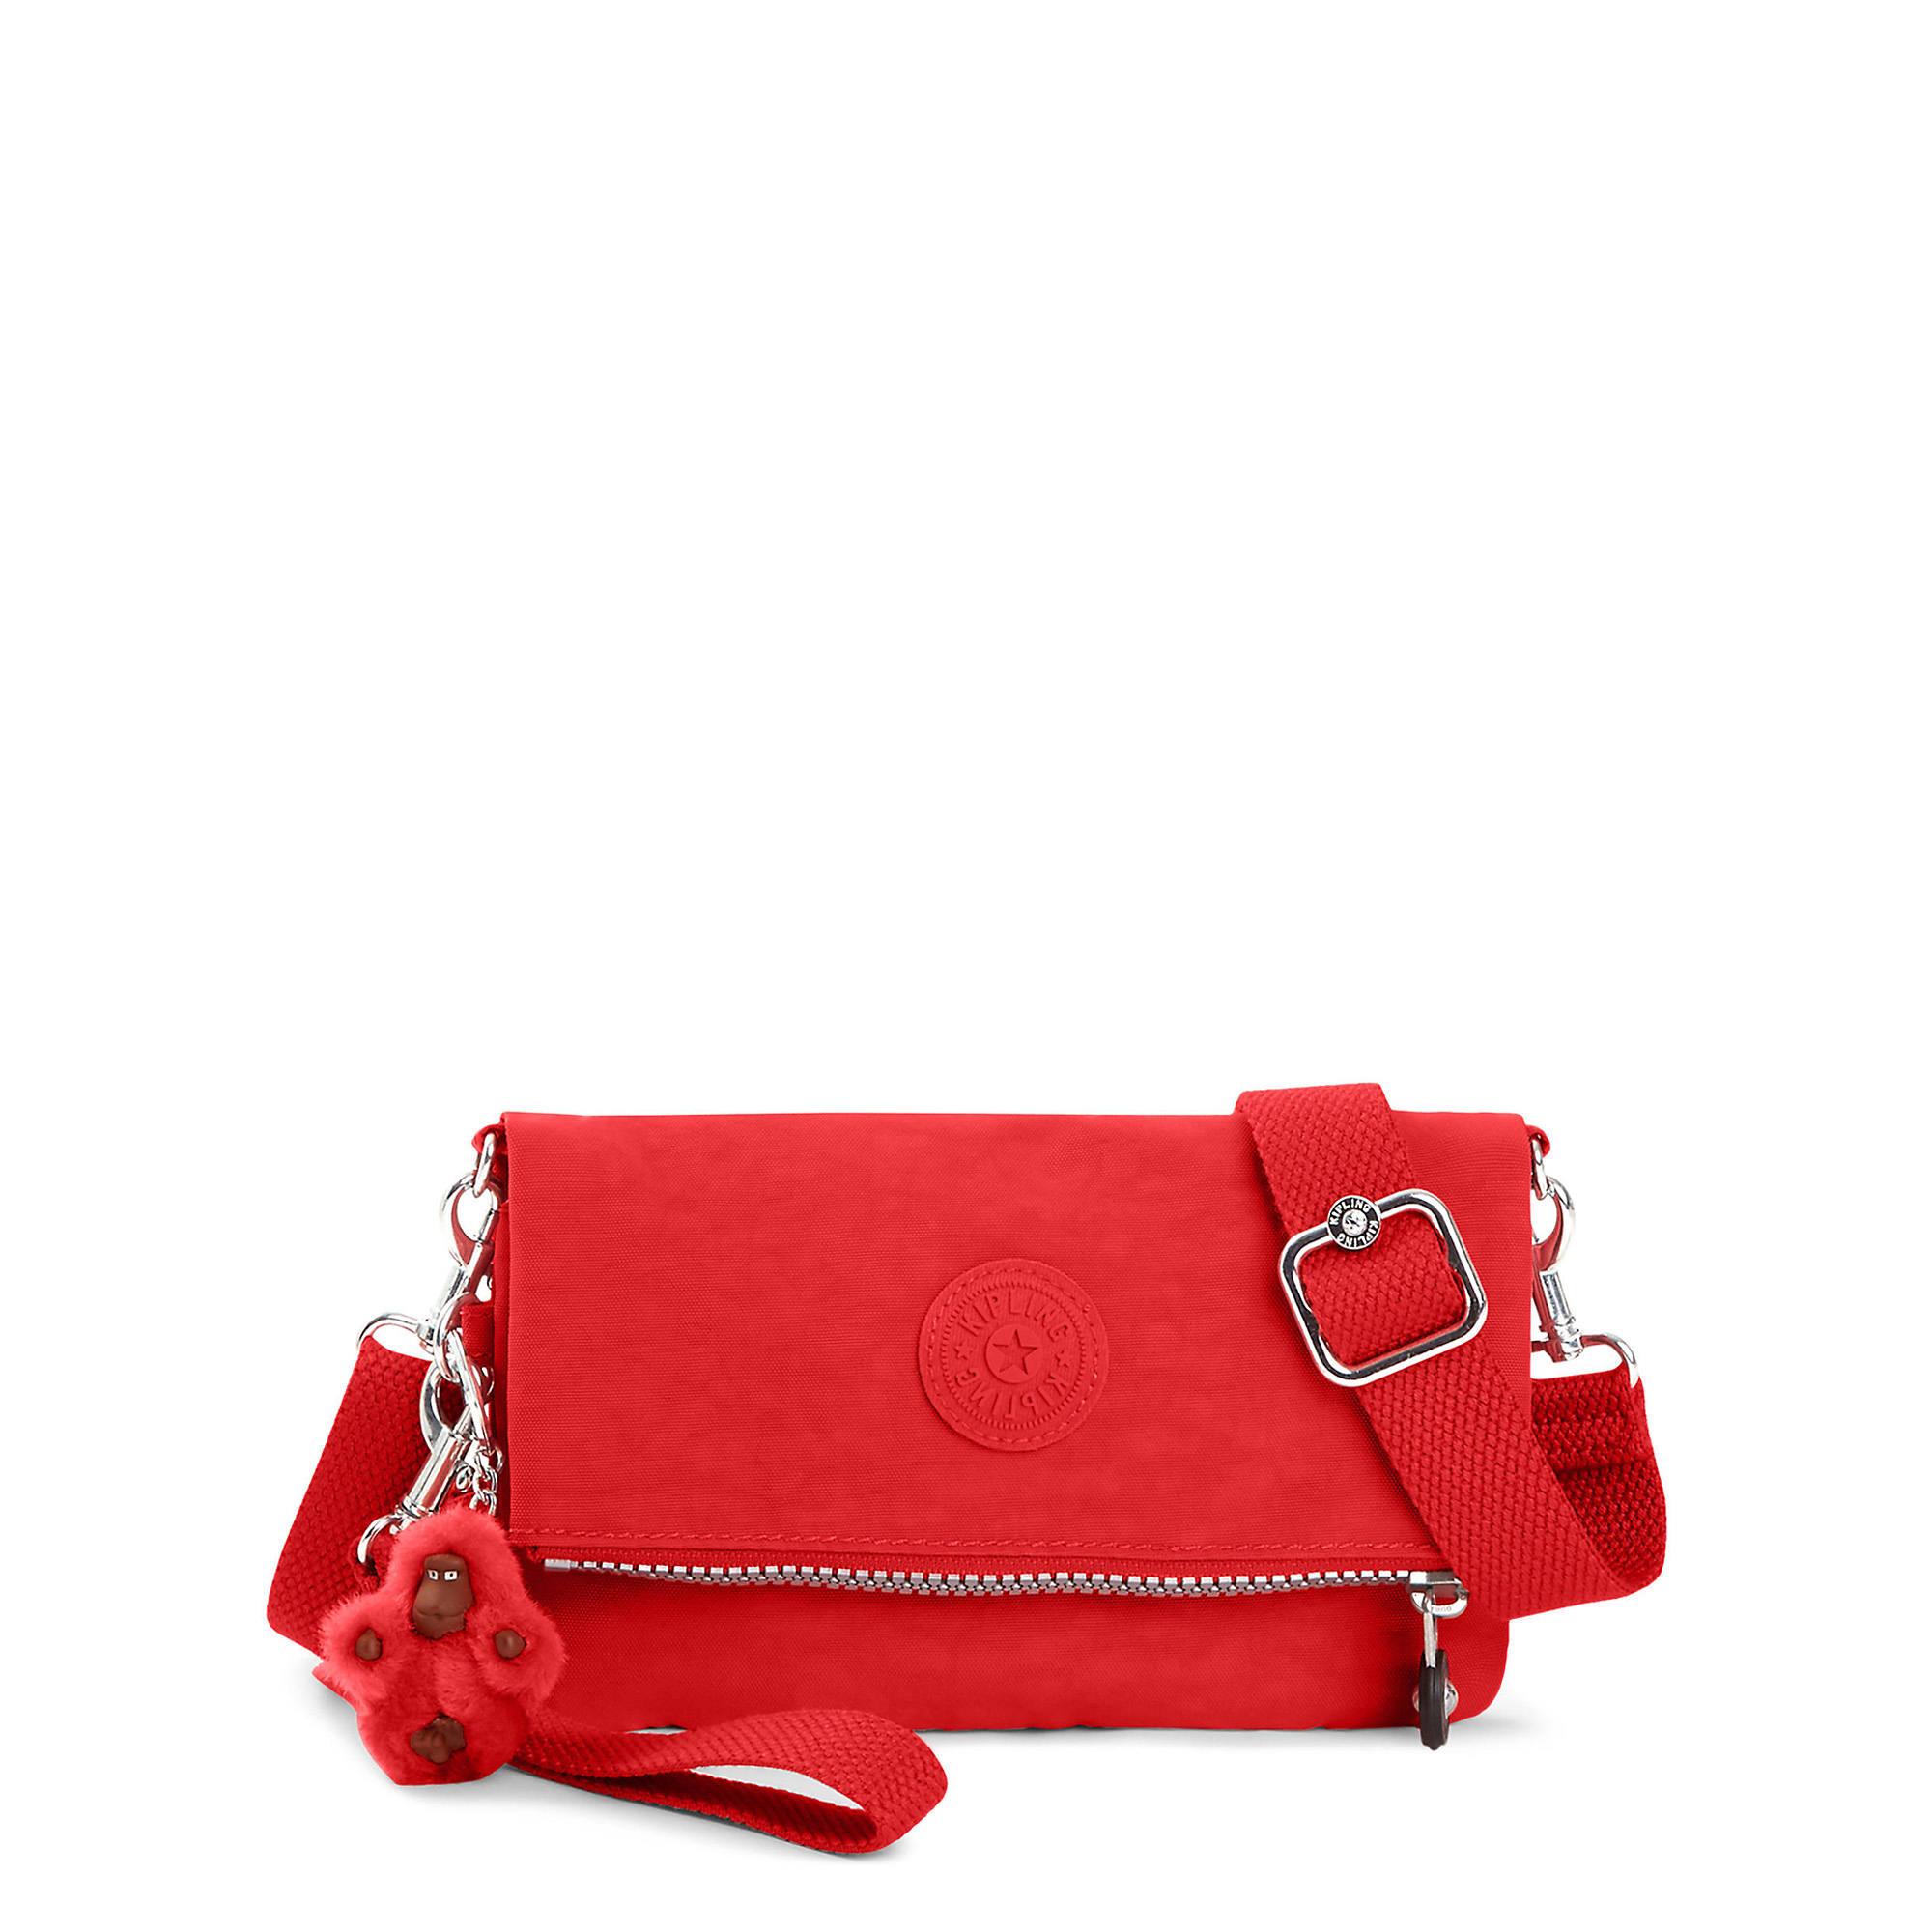 Lynne 3 In 1 Convertible Crossbody Bag Cherry Large